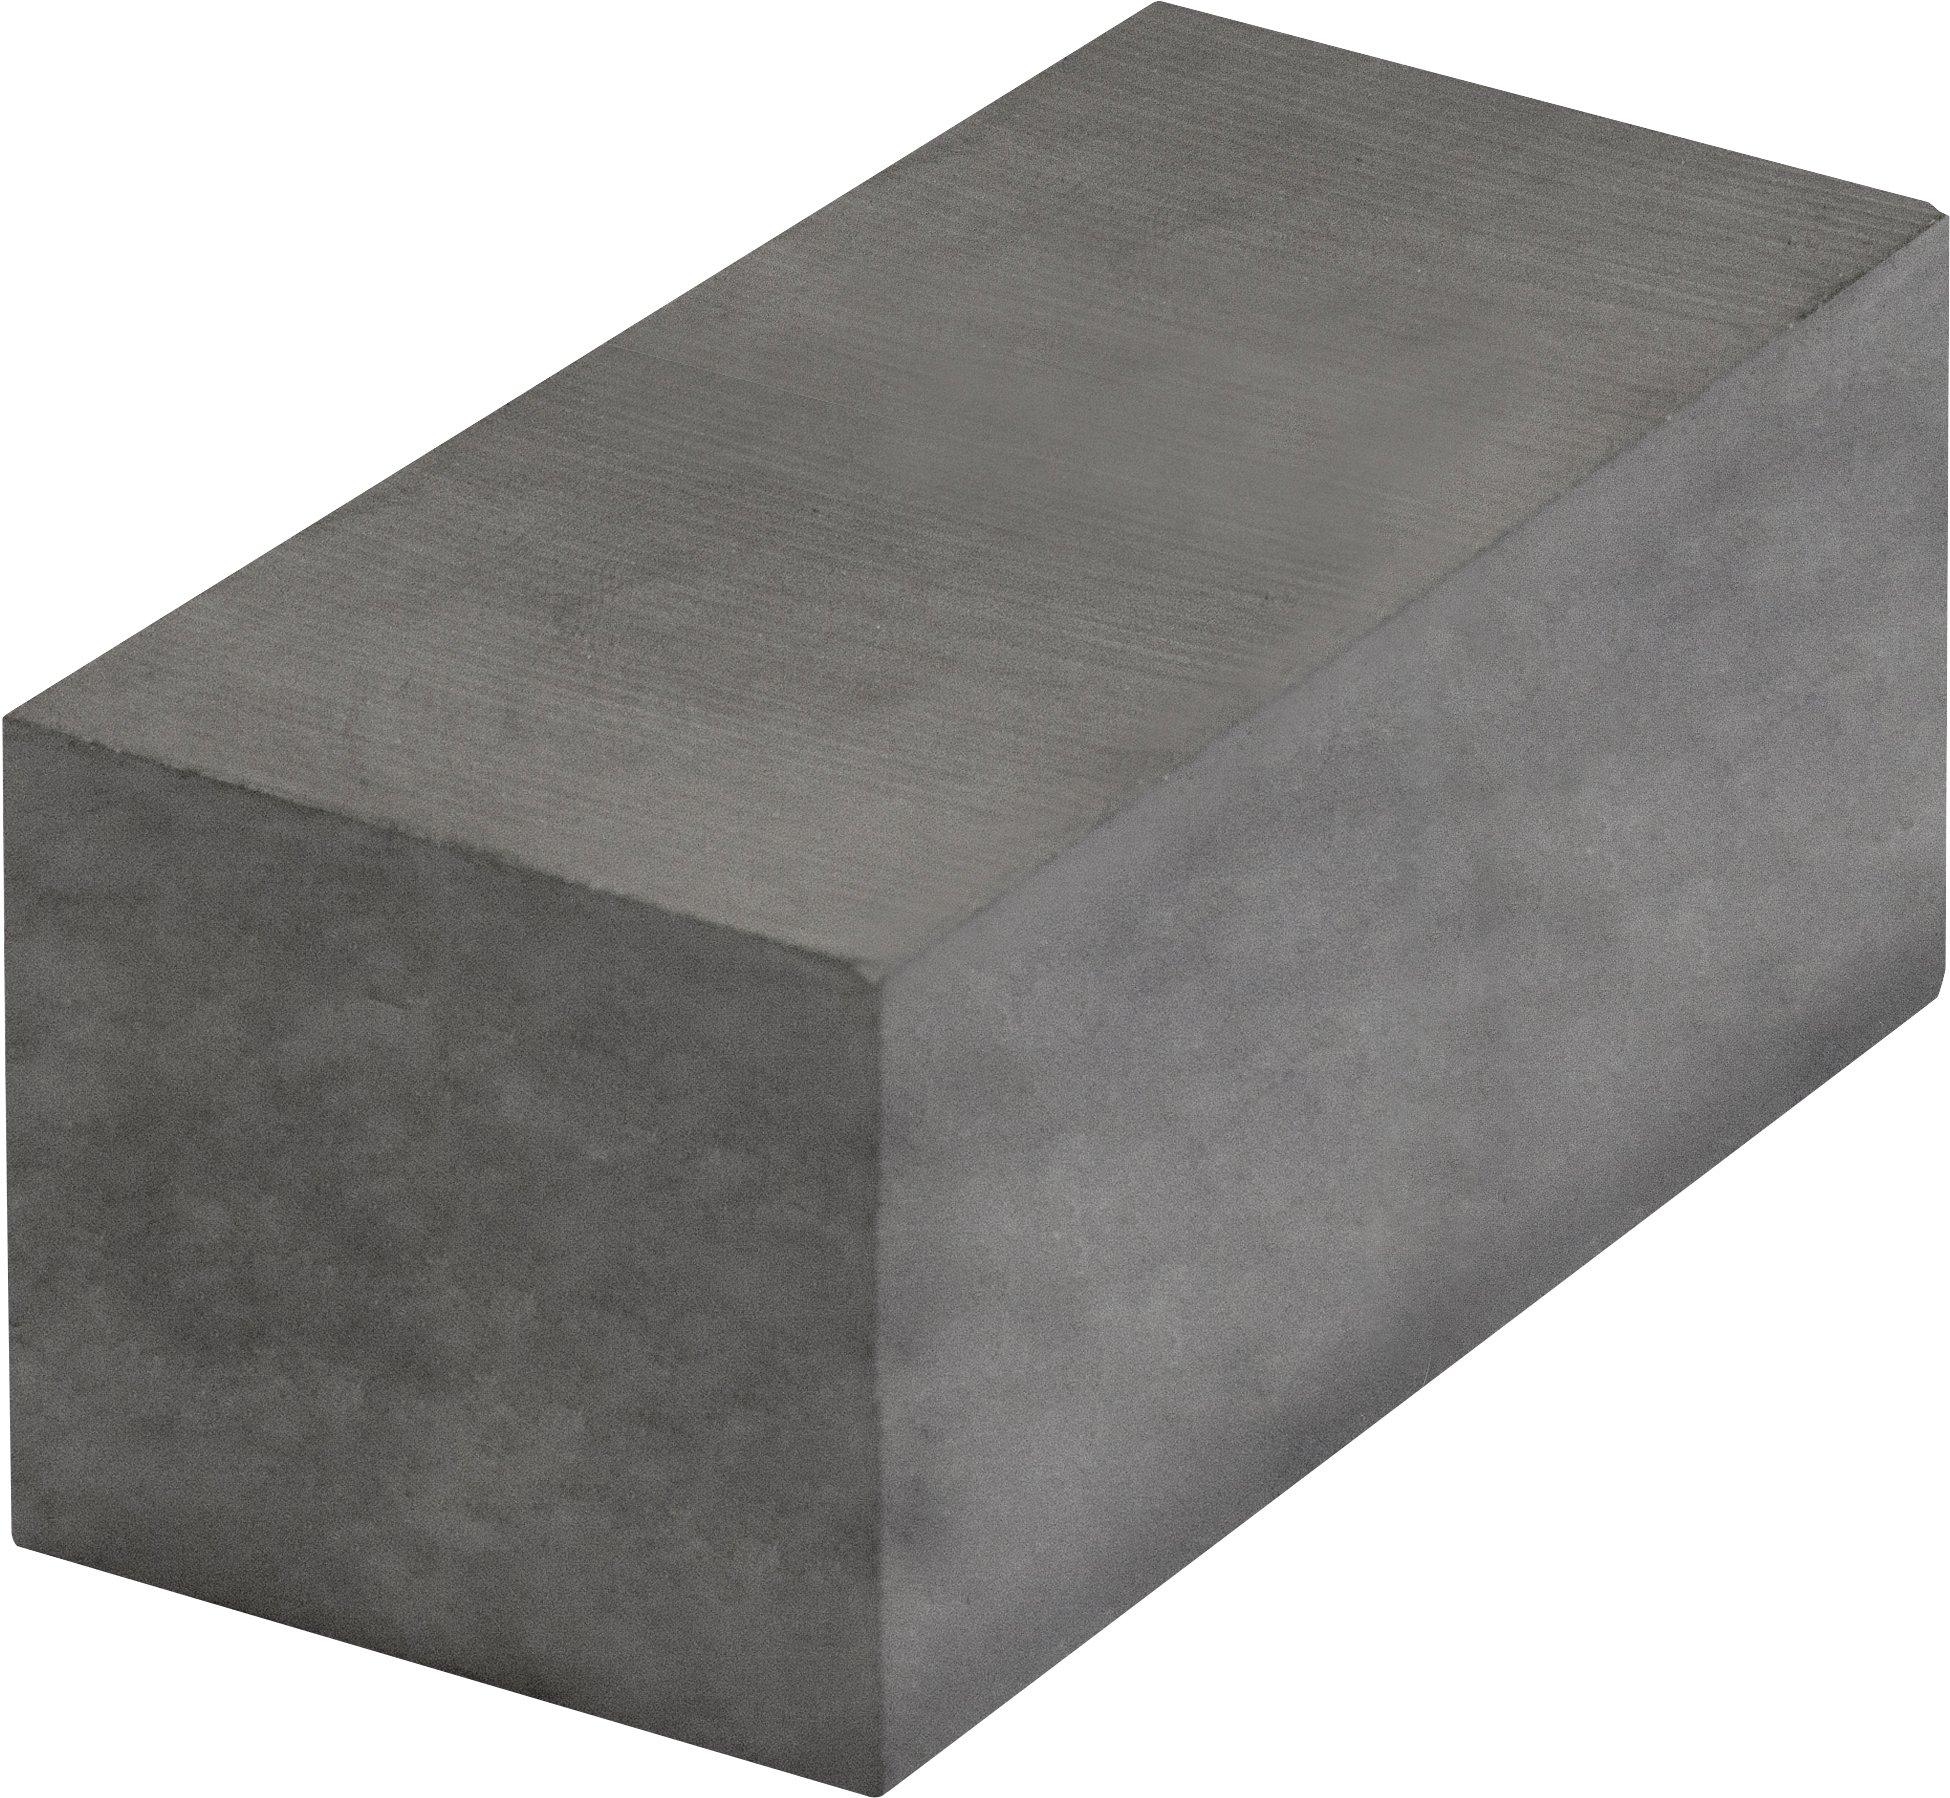 MAG-MATE 500X1X2C8 Grade 8 Ceramic Rectangular Bar Magnet, 1 x 2 x 1/2''/7 lb